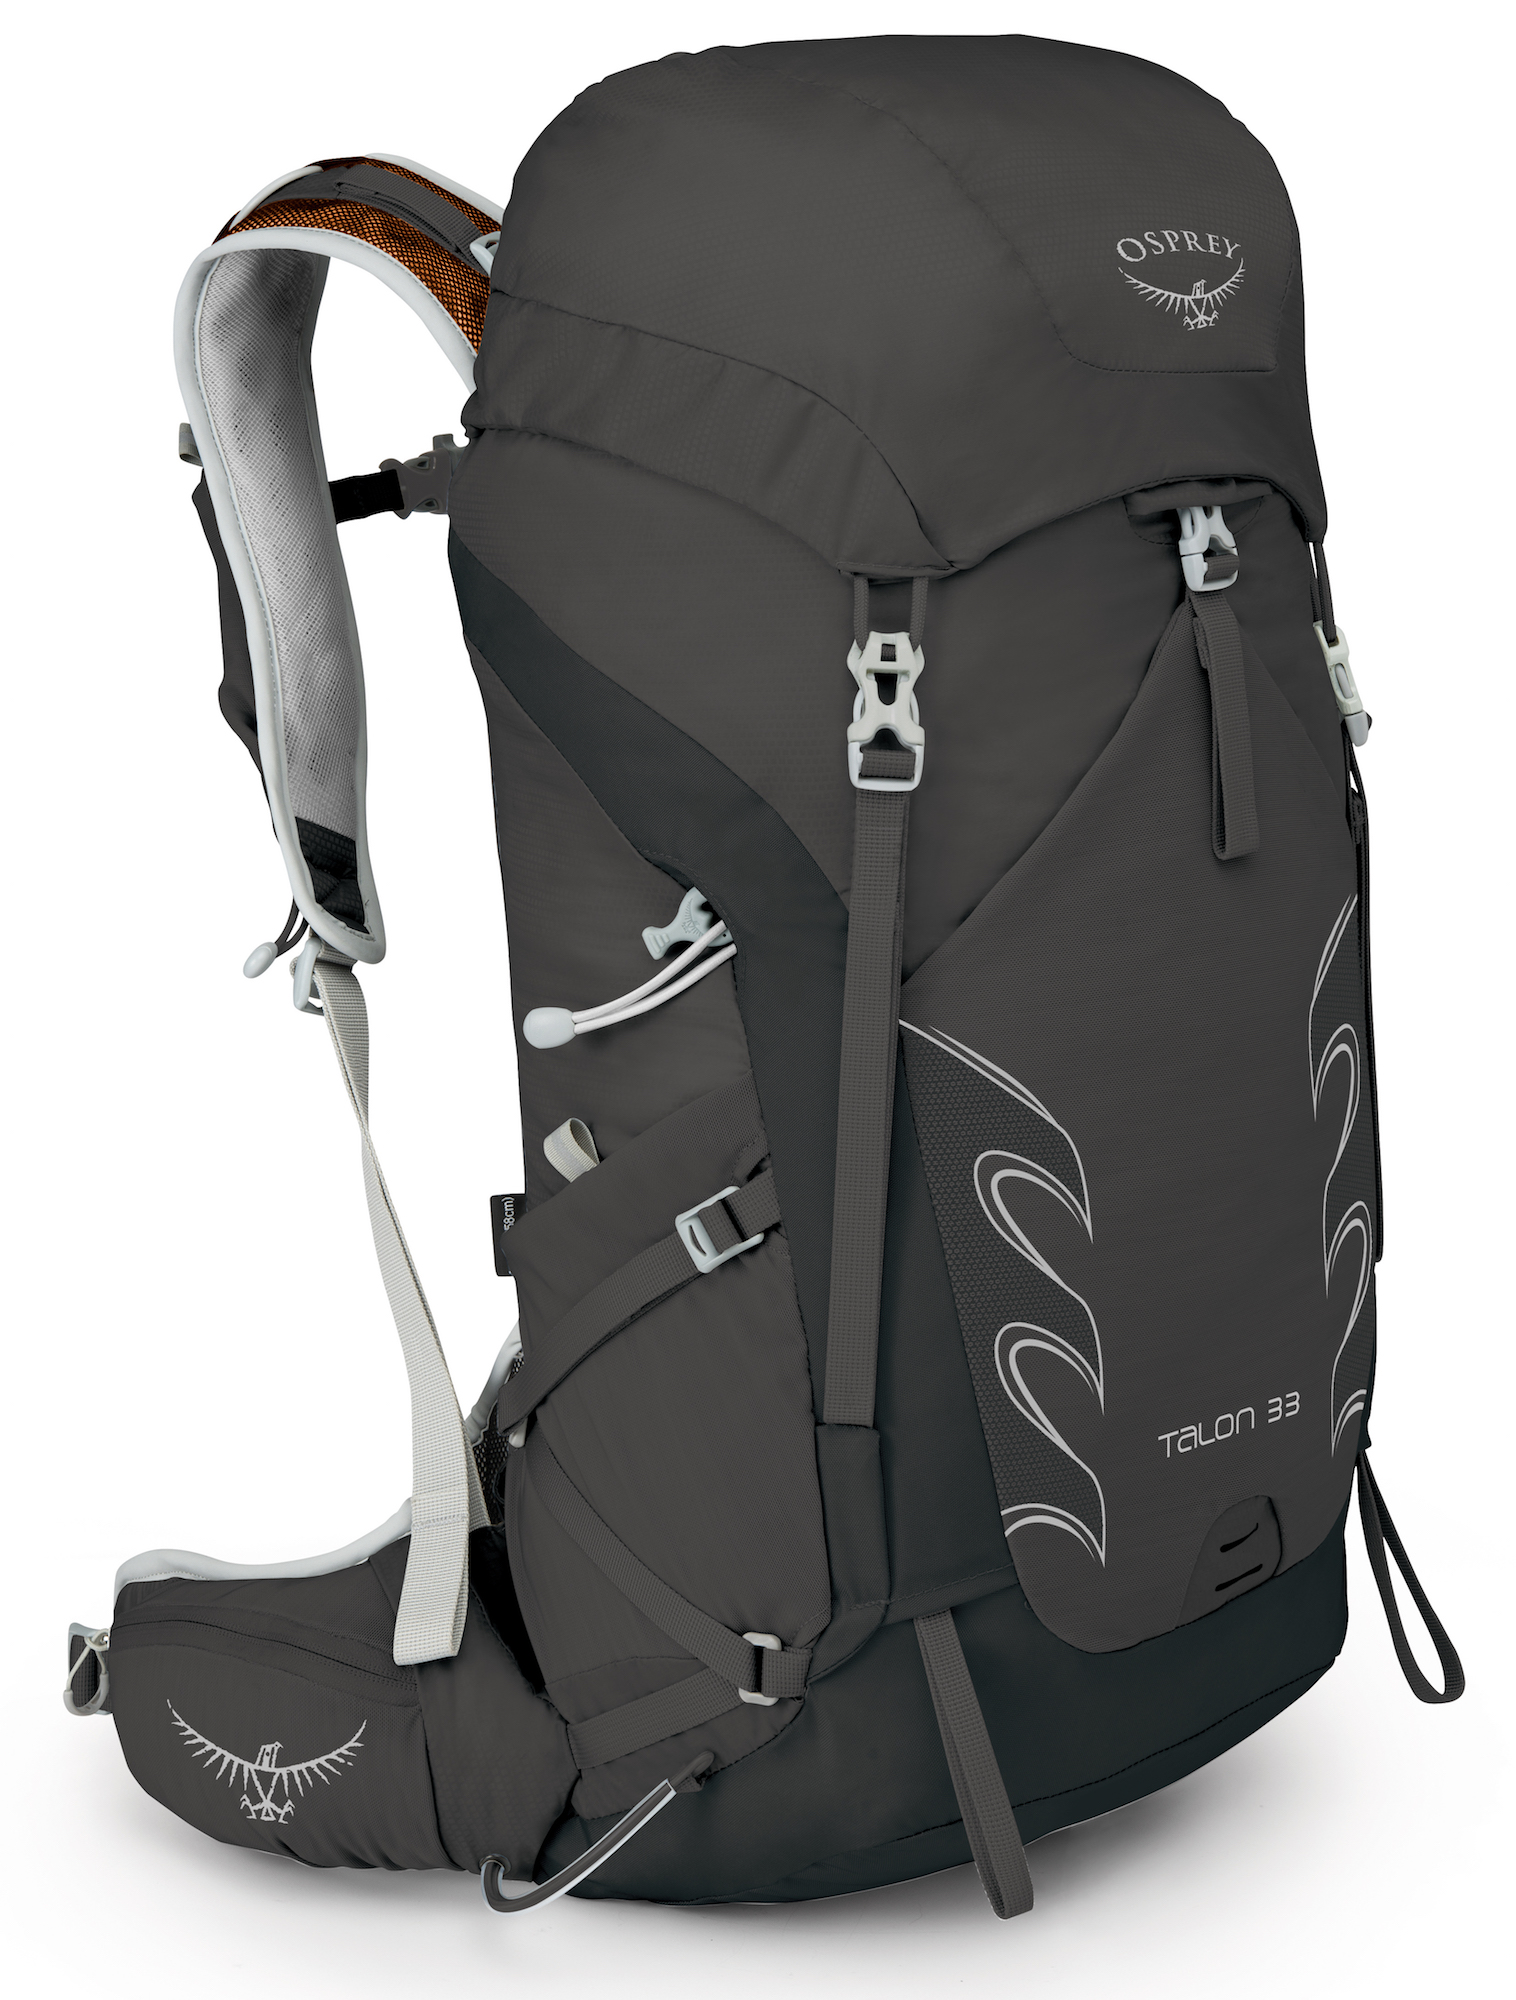 Osprey Talon 33 - Sac à dos homme